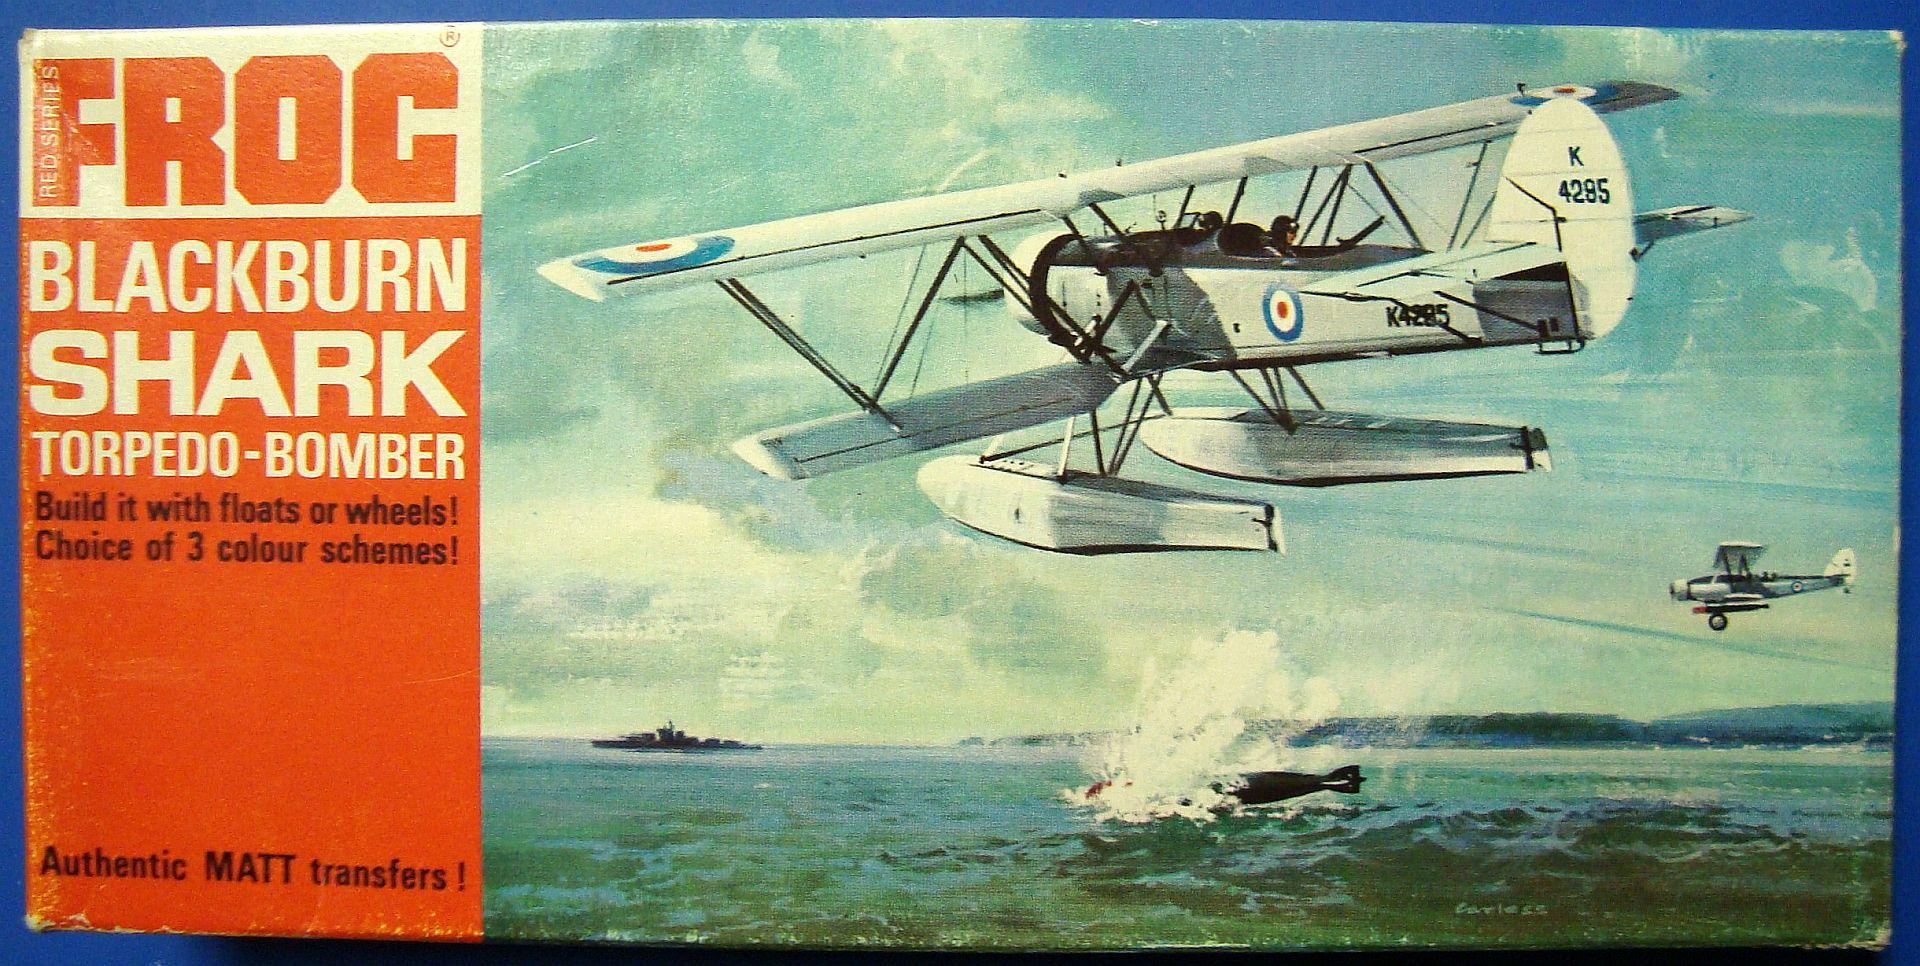 BLACKBURN SHARK, 1/72 FROG, NÁHLED DO KRABIČKY